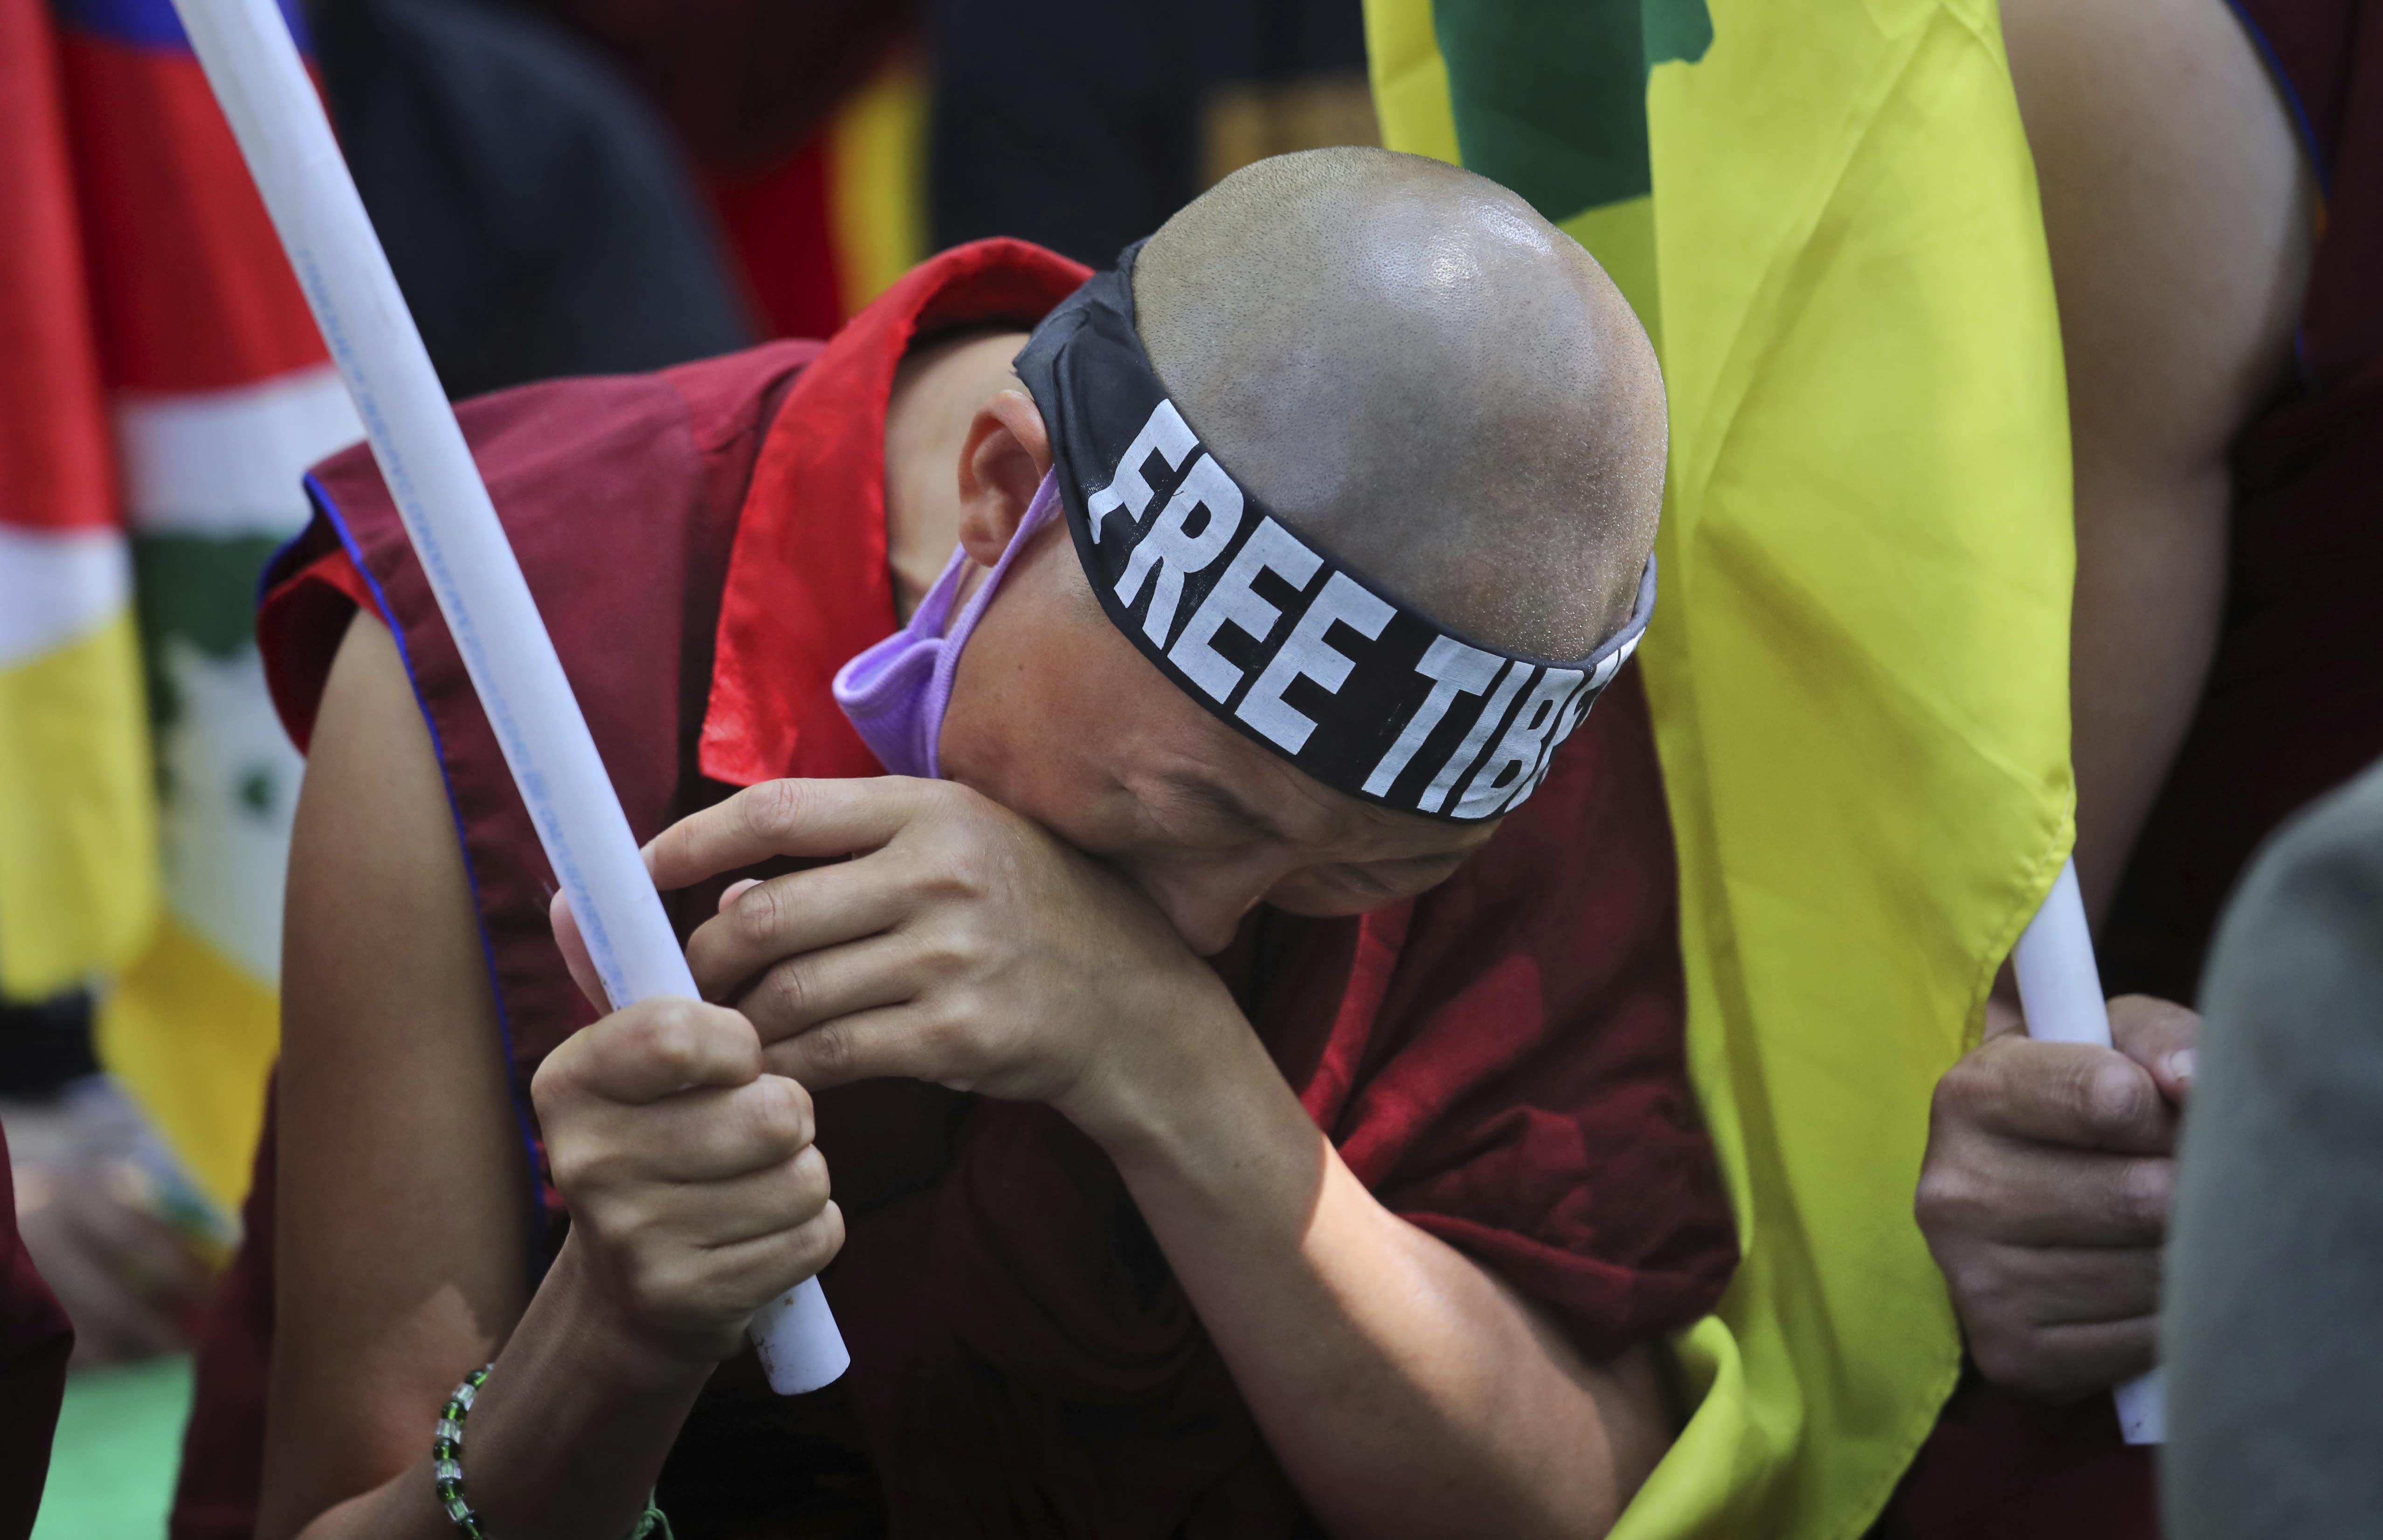 60 years after Dalai Lama fled, China defends Tibet policies